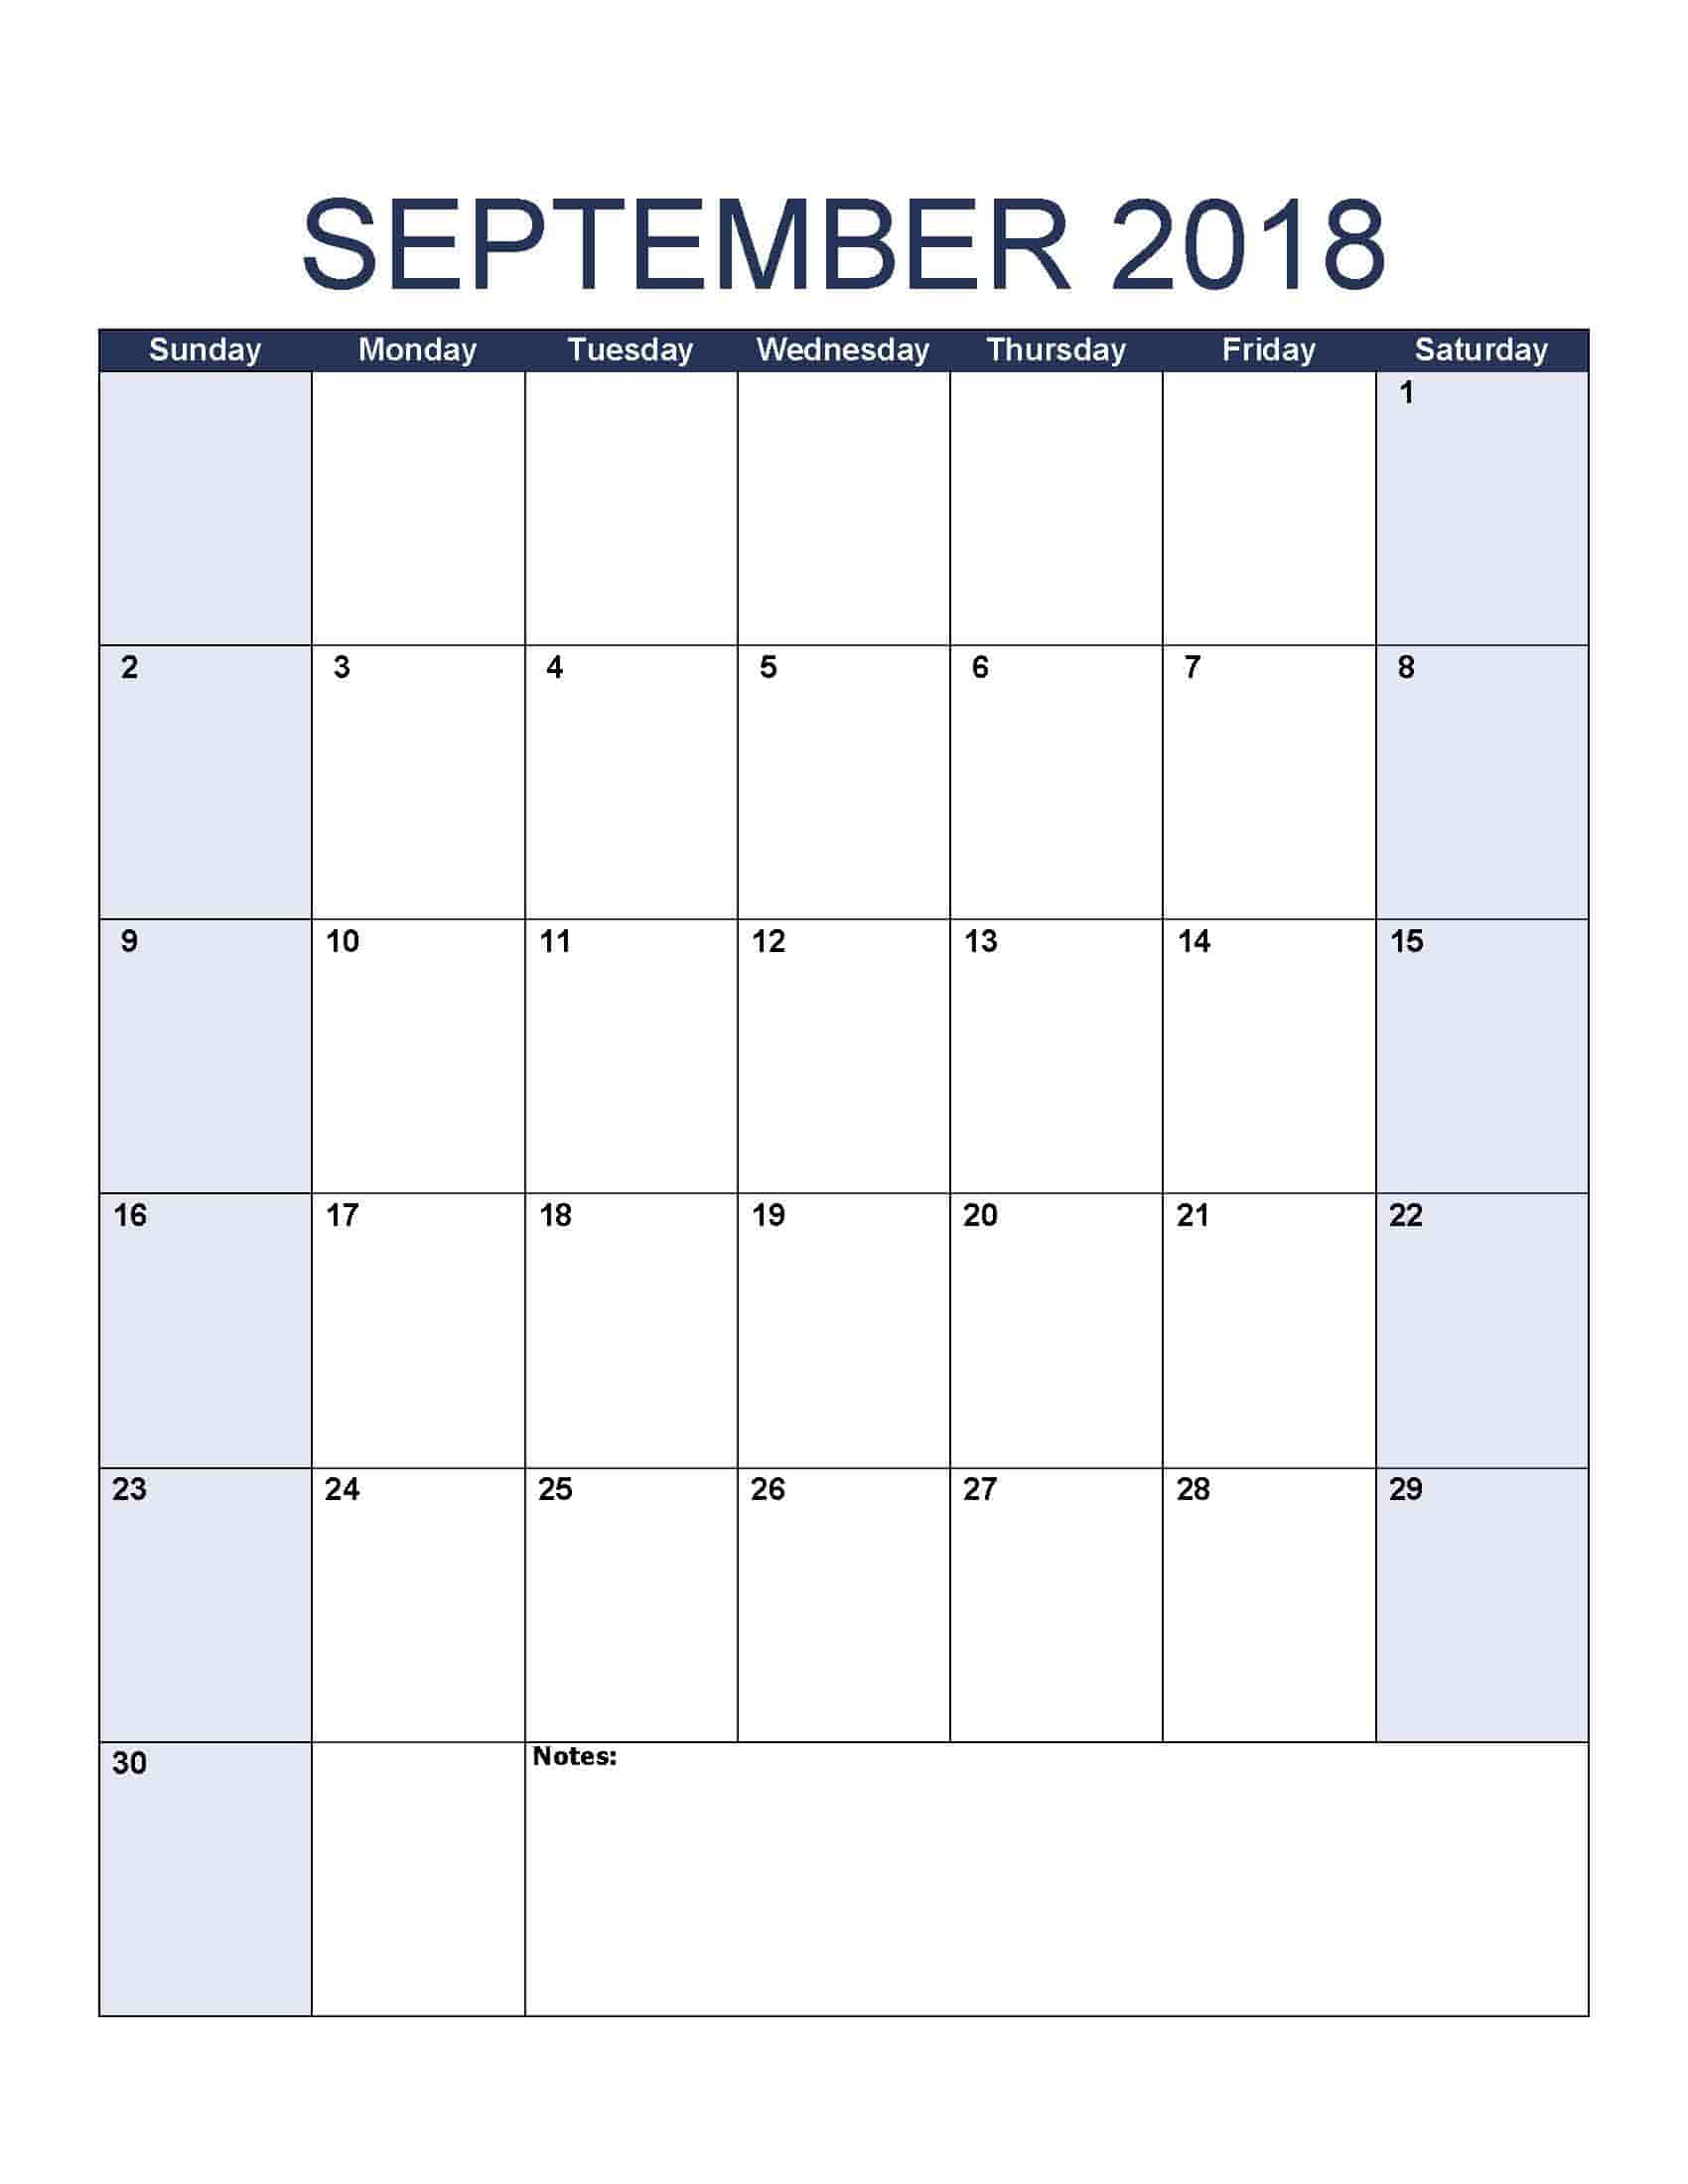 September 2018 Calendar - Free, Printable Calendar Templates in Free Printable September Blank Calendars With Christian Themes